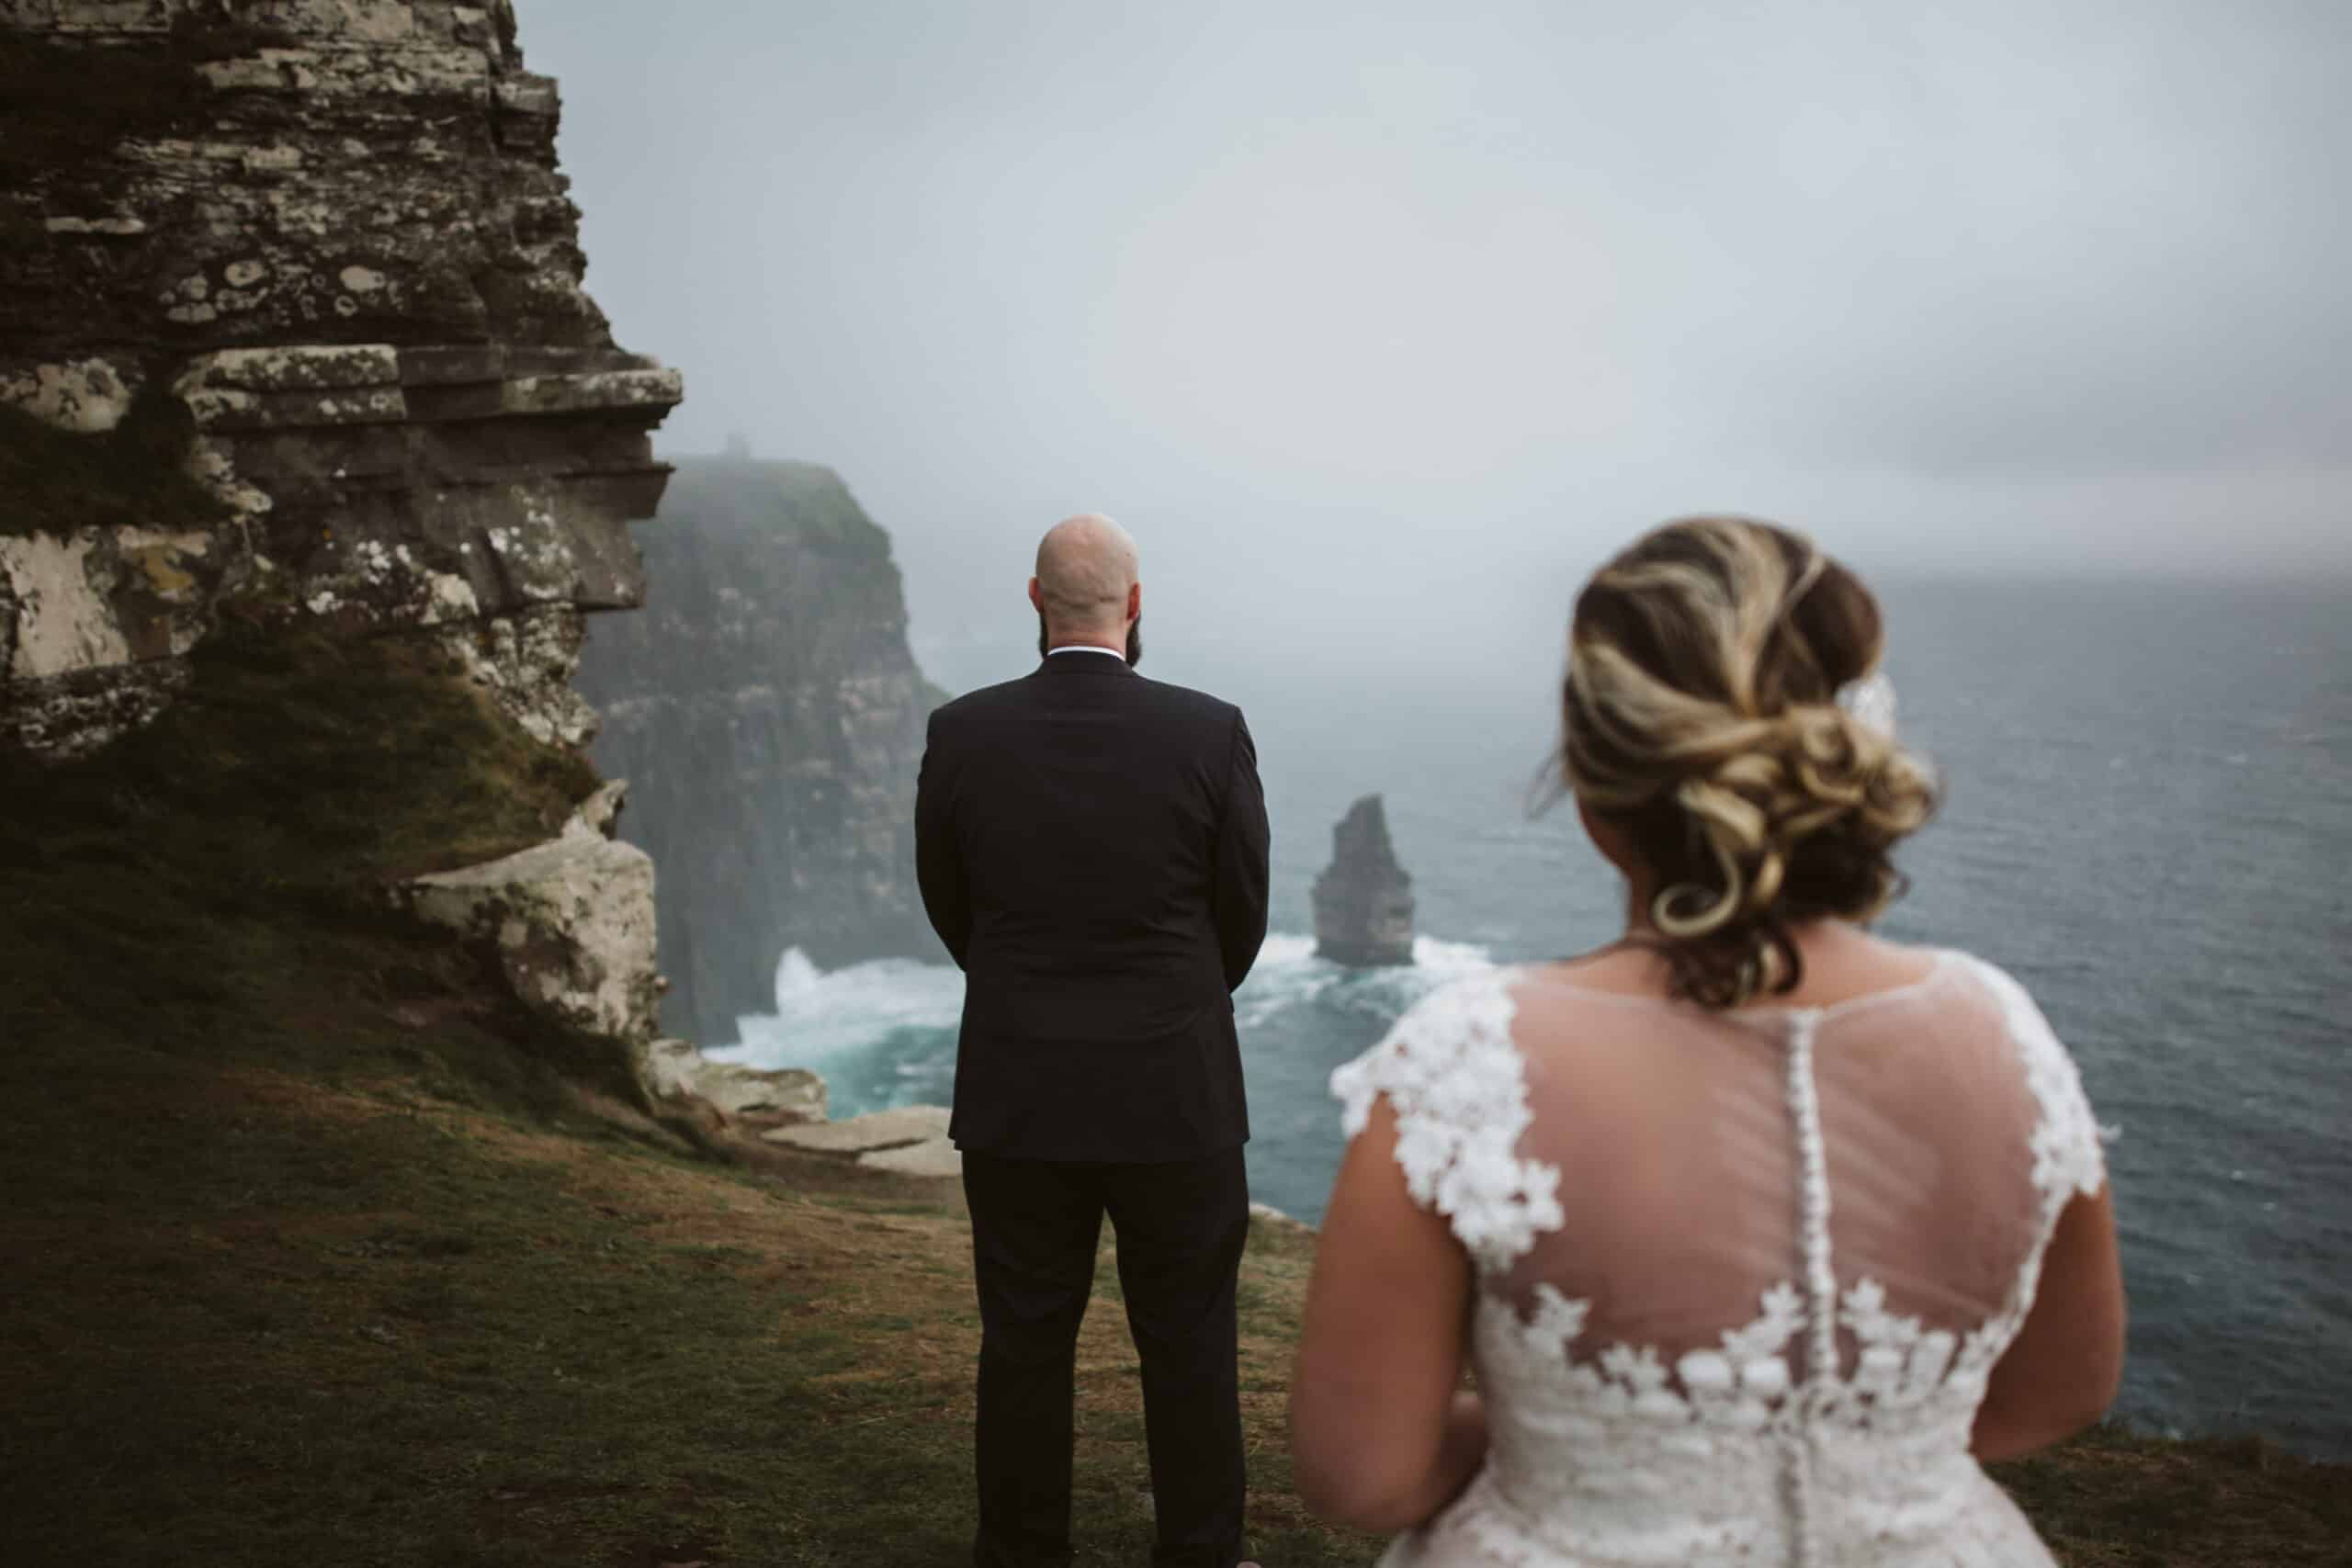 Ireland Cliffs of Moher Wedding Hags head First Look, bride is walking up behind the groom